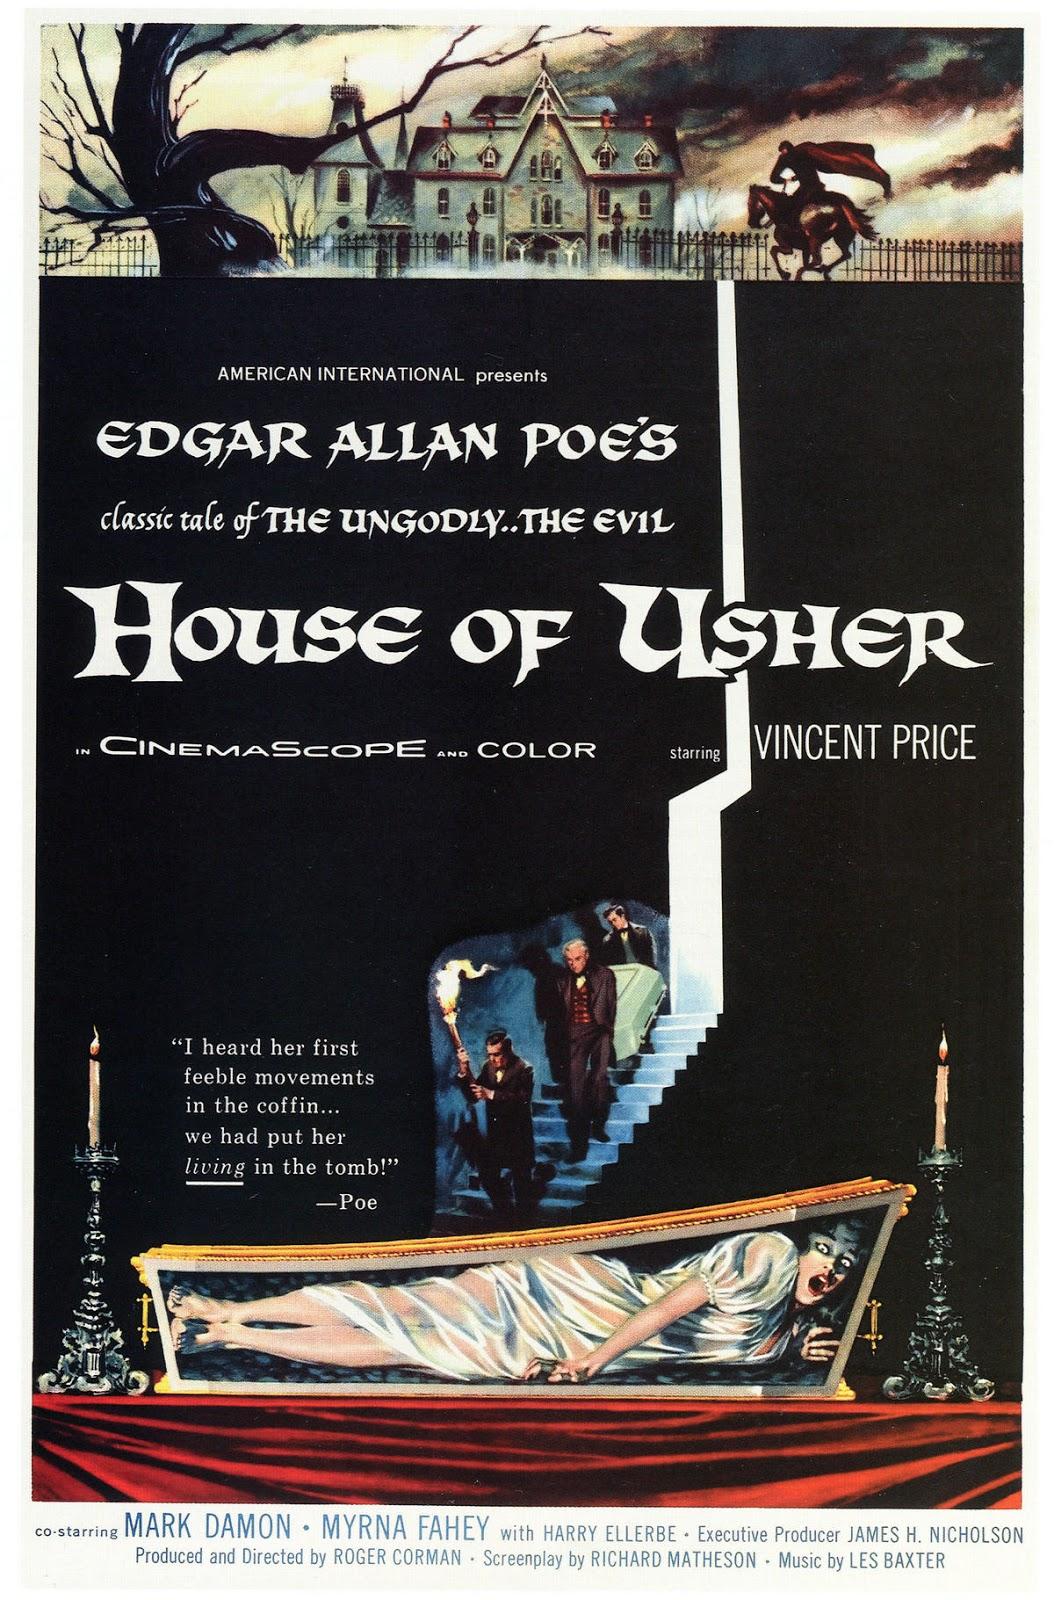 La Chute De La Maison Usher Film : chute, maison, usher, House, Usher, (film), Wikipedia